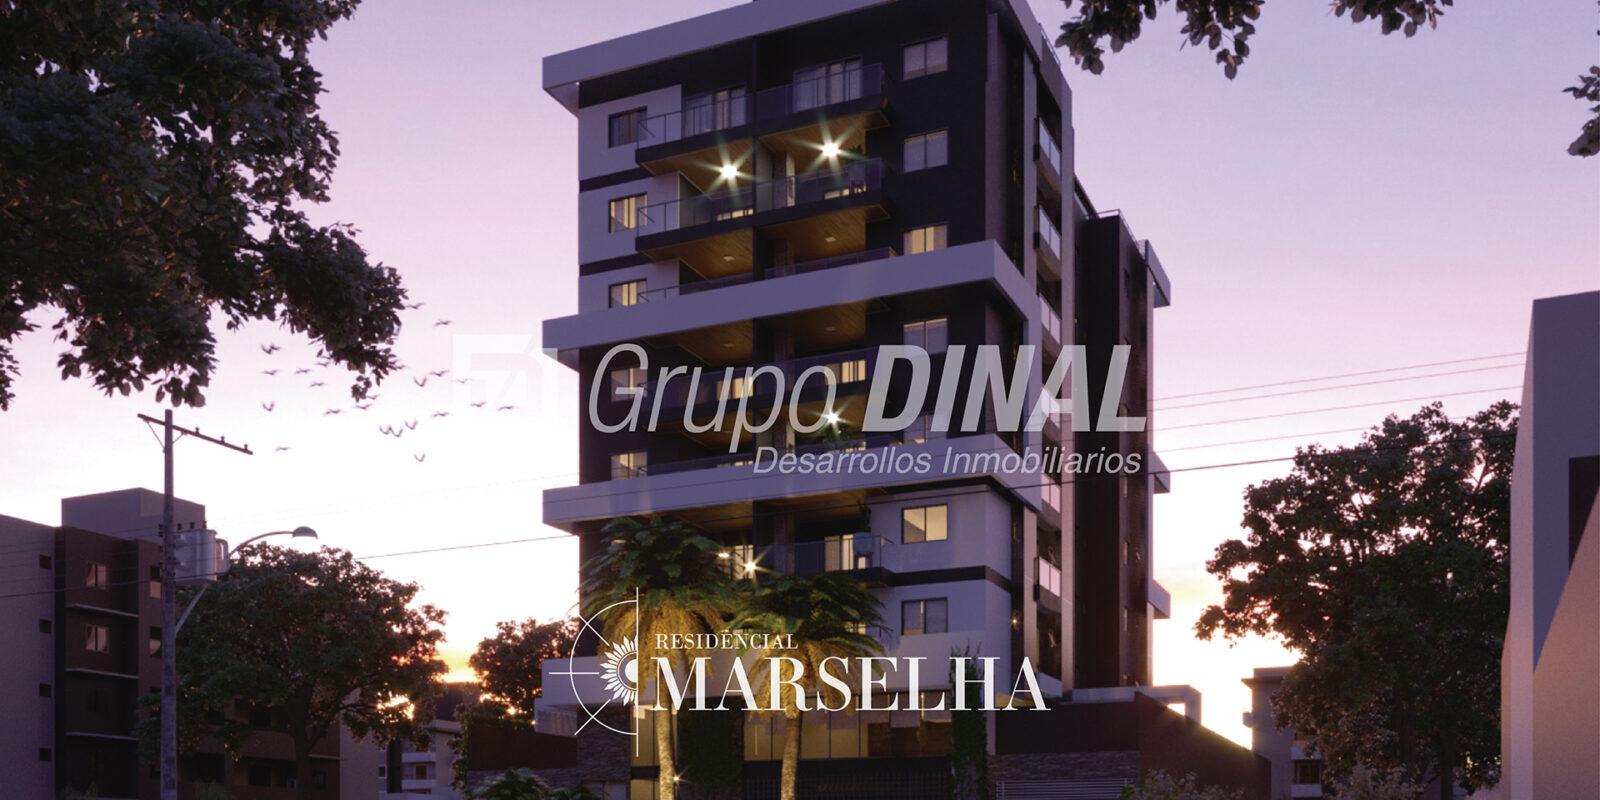 Residencial Marselha | Rua União  508,  Caiobá, Brasil